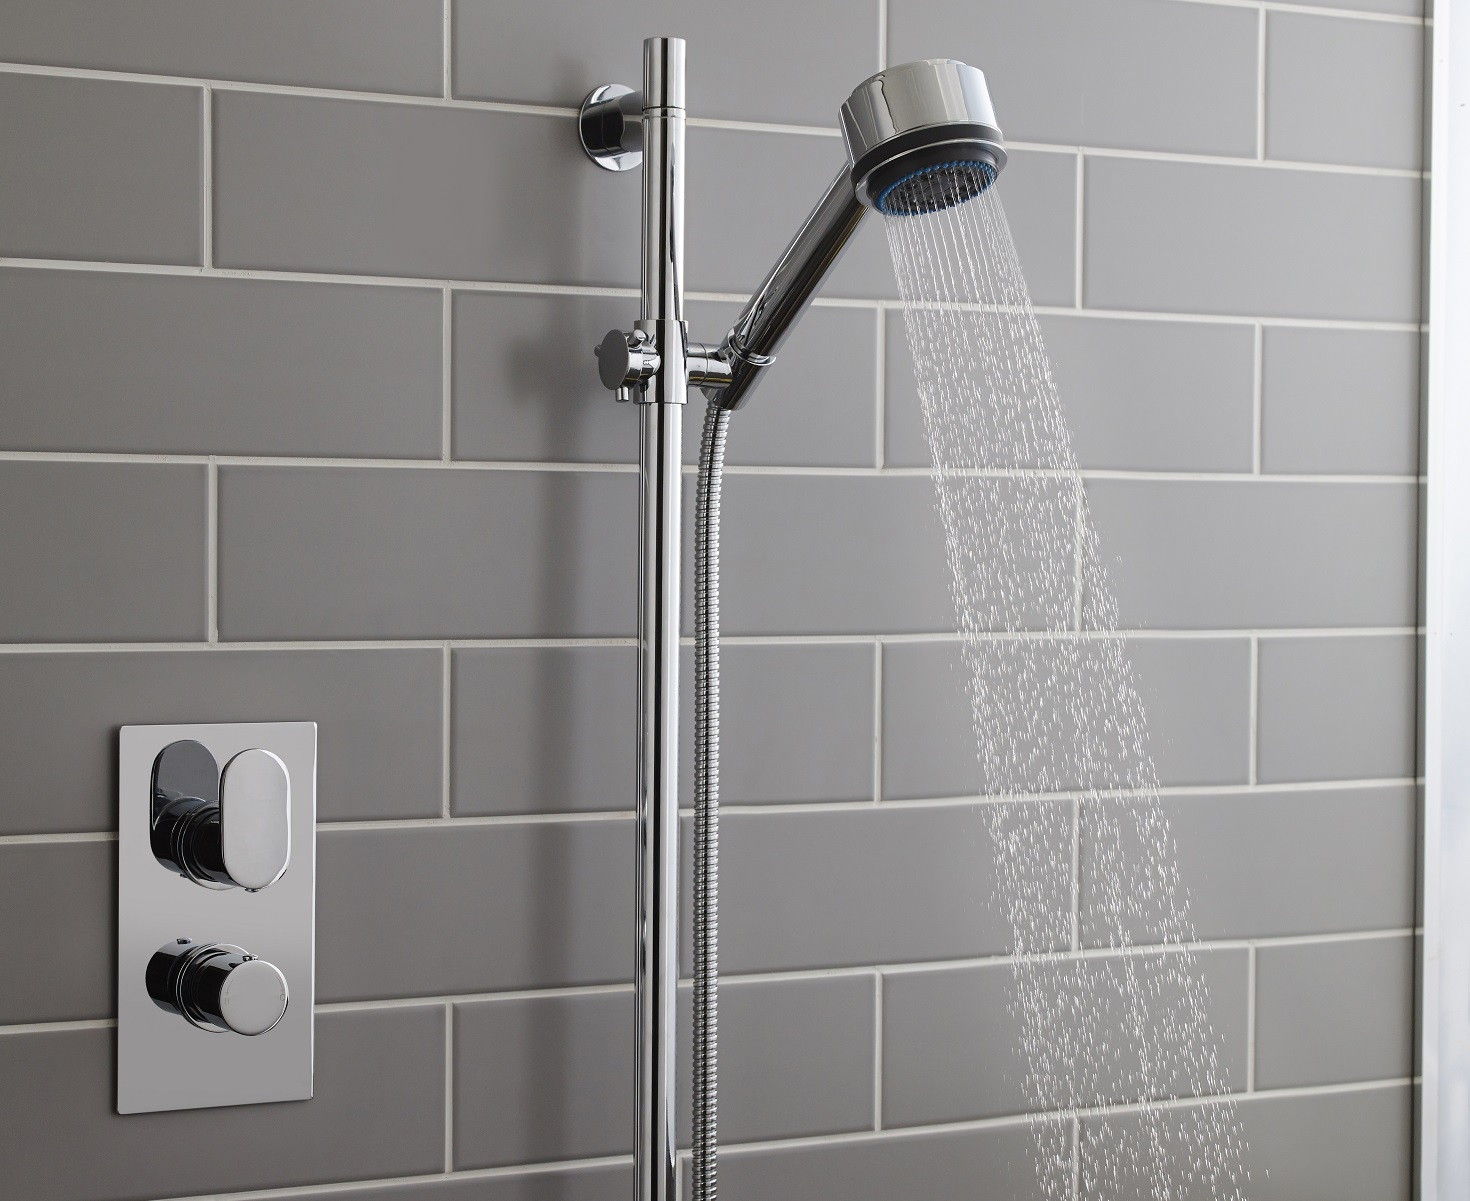 How to Descale a Shower Head | Big Bathroom Shop